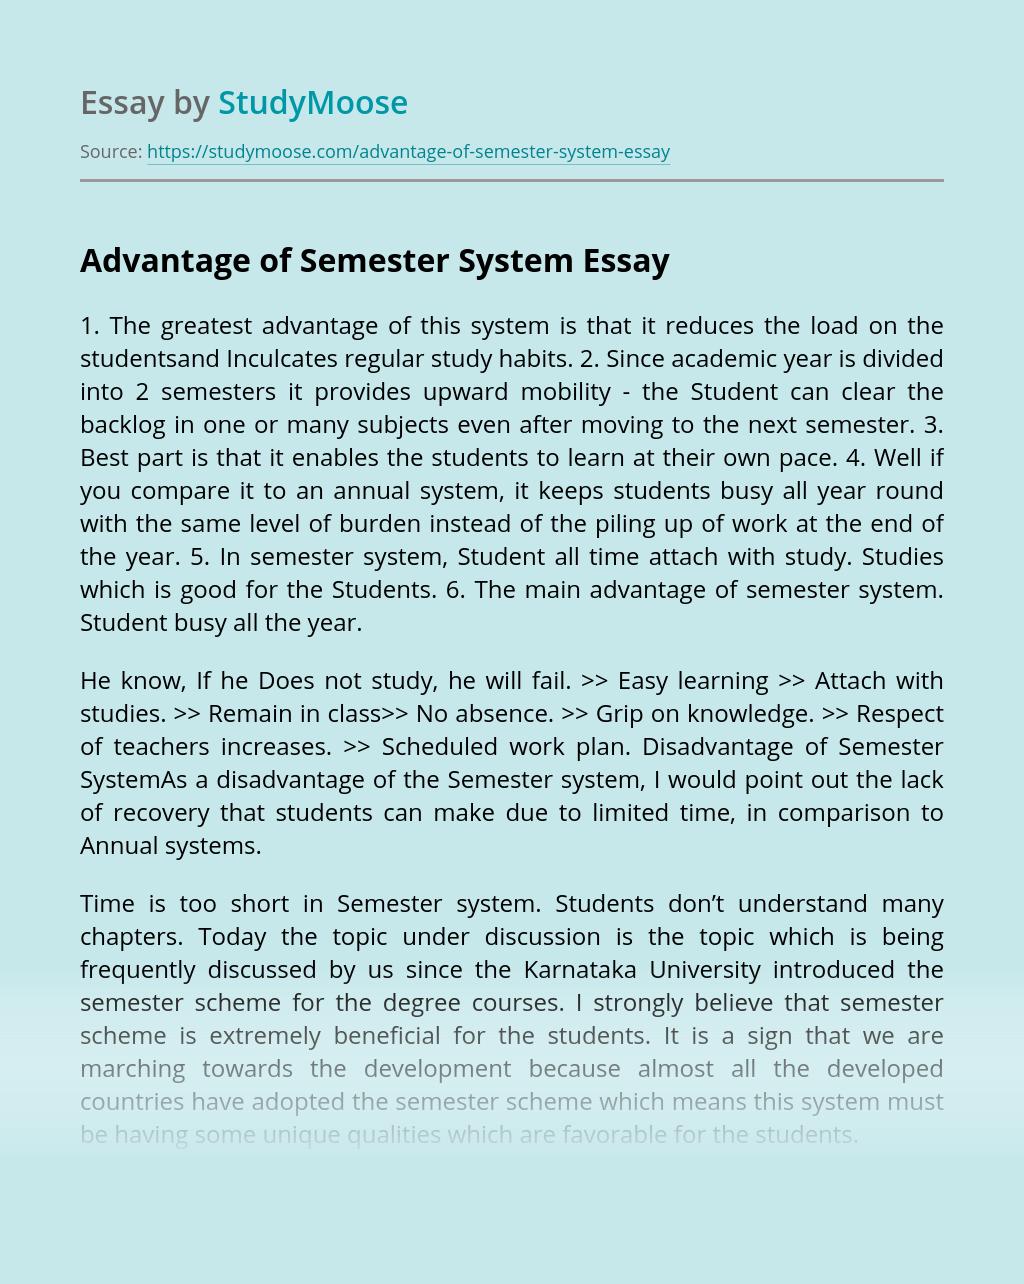 Advantage of Semester System